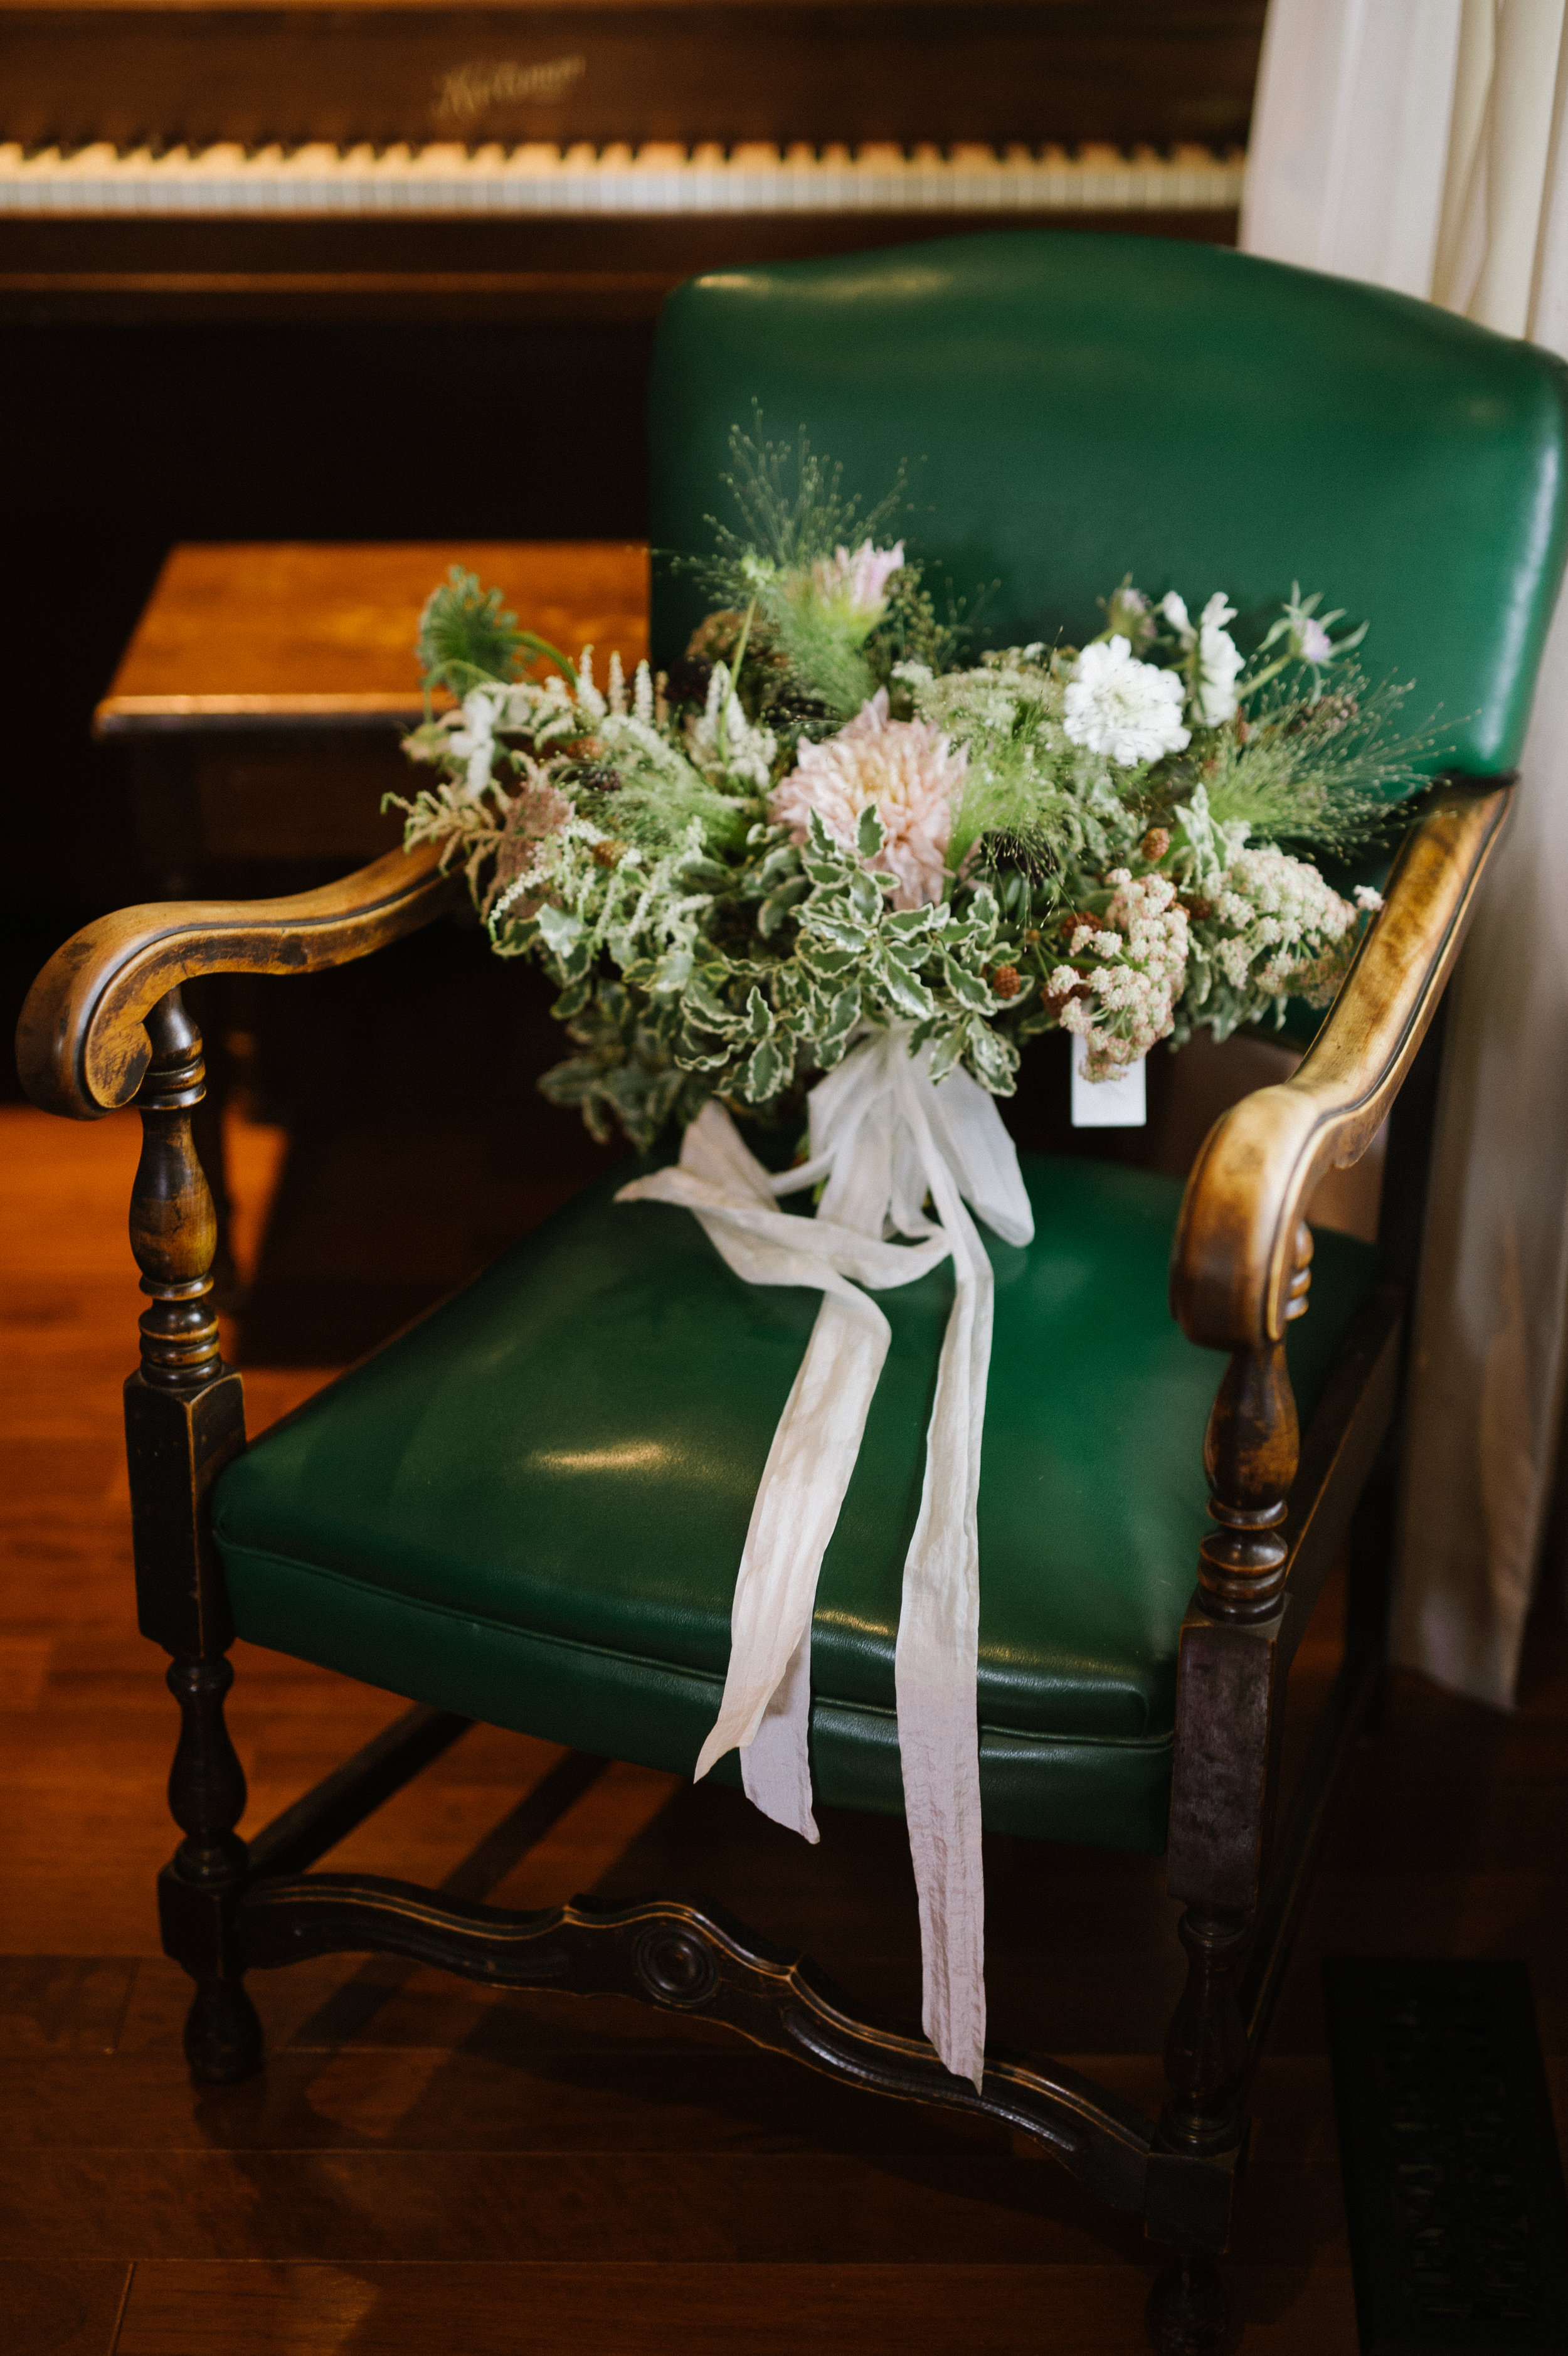 Teatro_Wedding_Calgary_Wedding_Photography_Vanessa_Tom_Married_2018_HR173.jpg